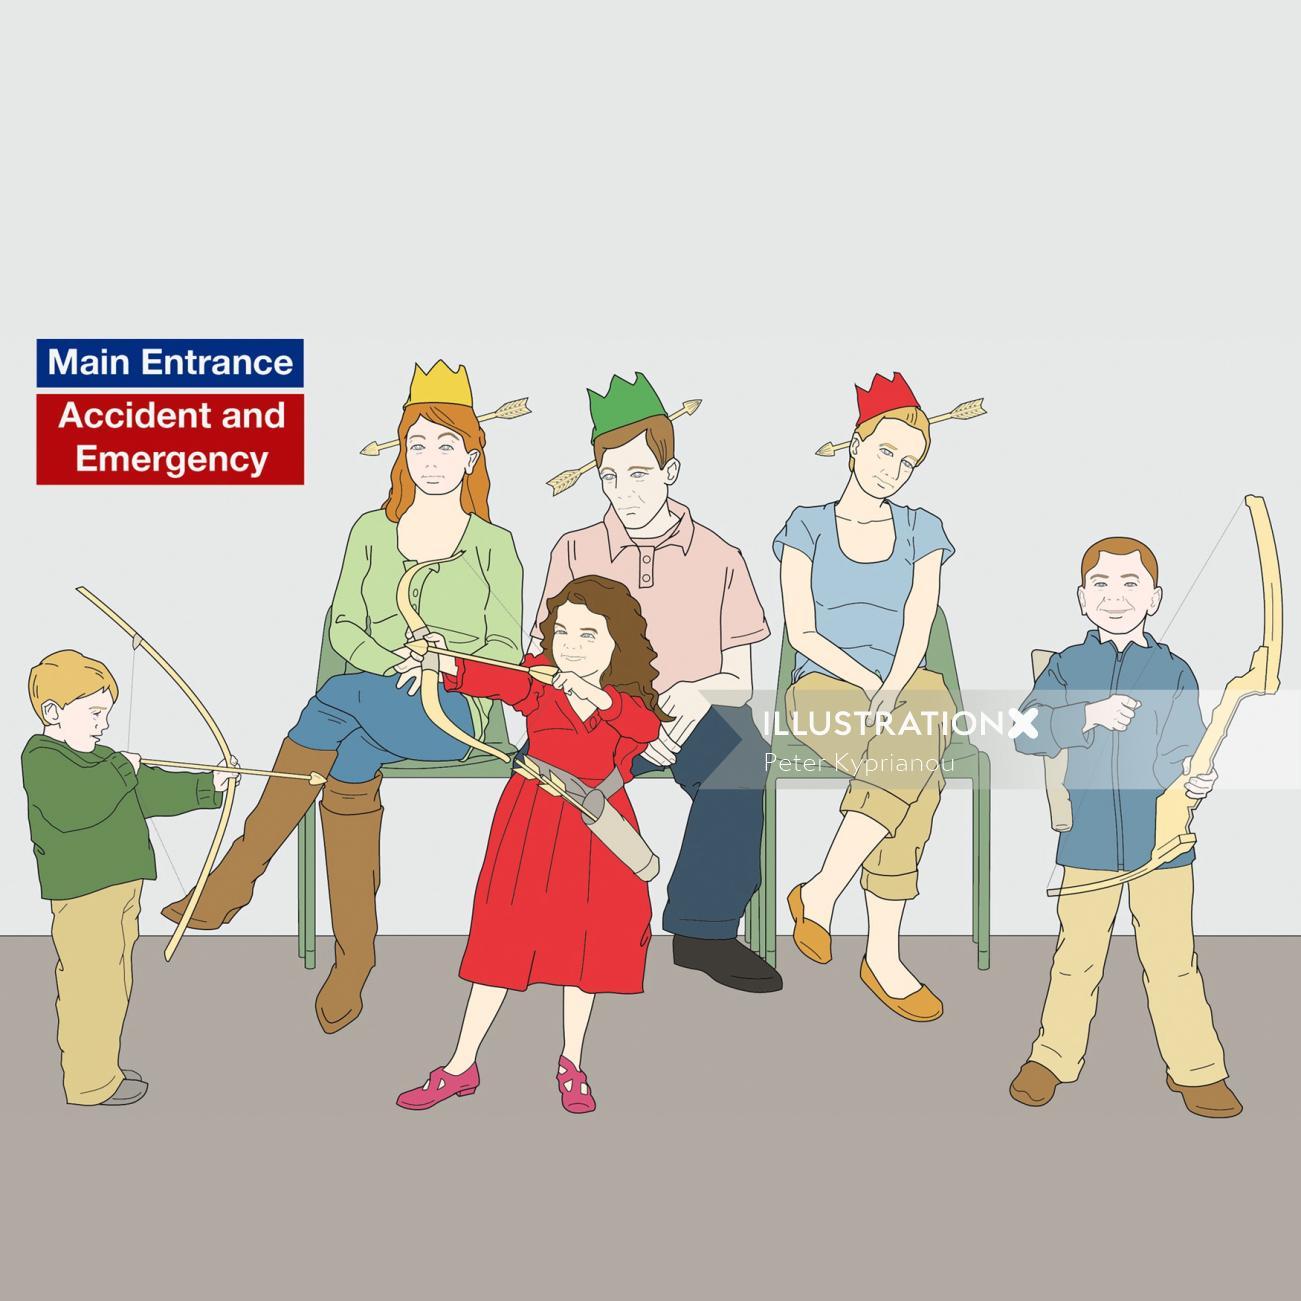 Cartoon illustration of children's playing